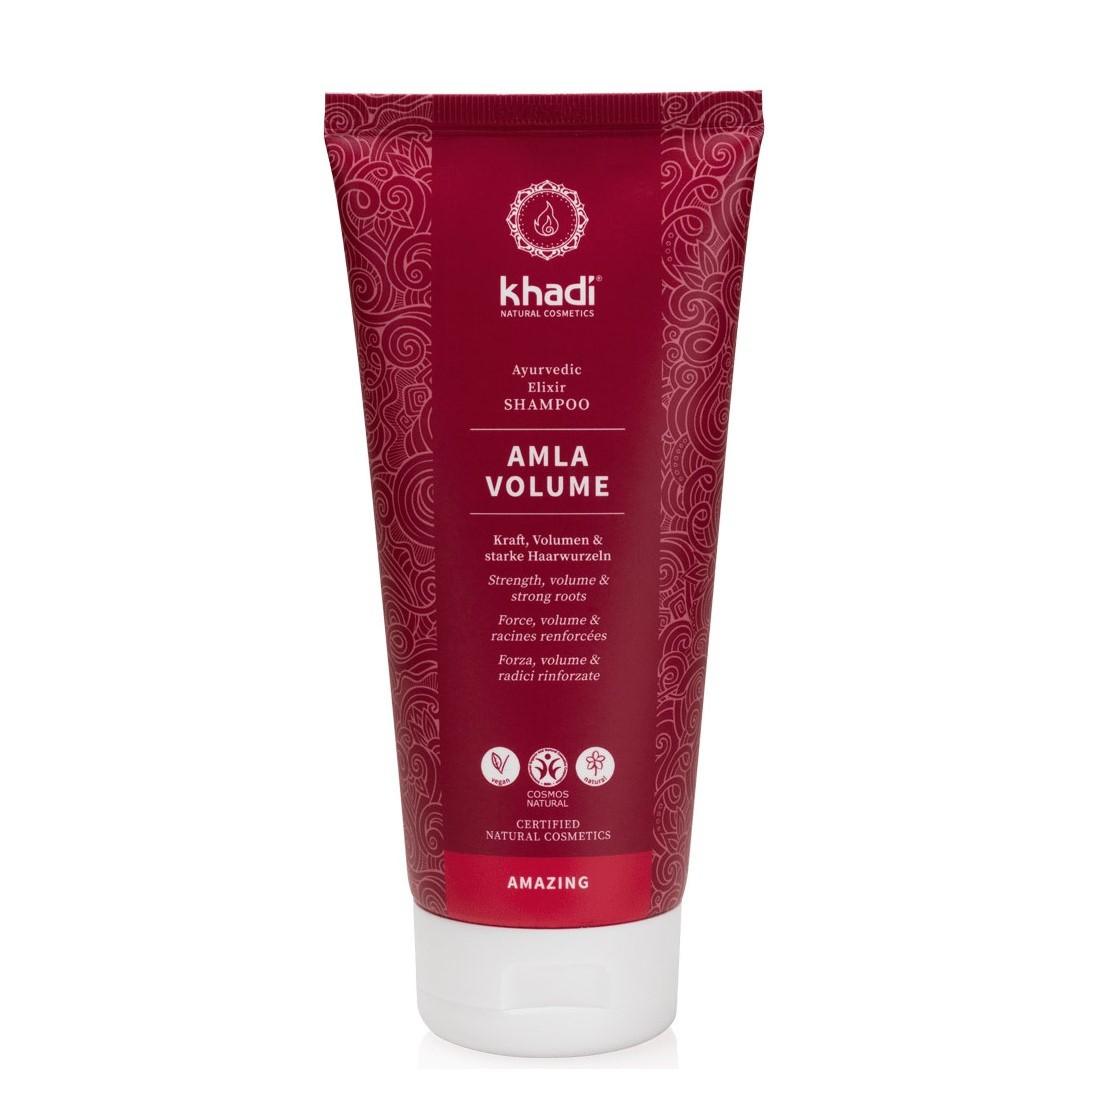 khadi shampoo-elisir-ayurvedico-amla-volume